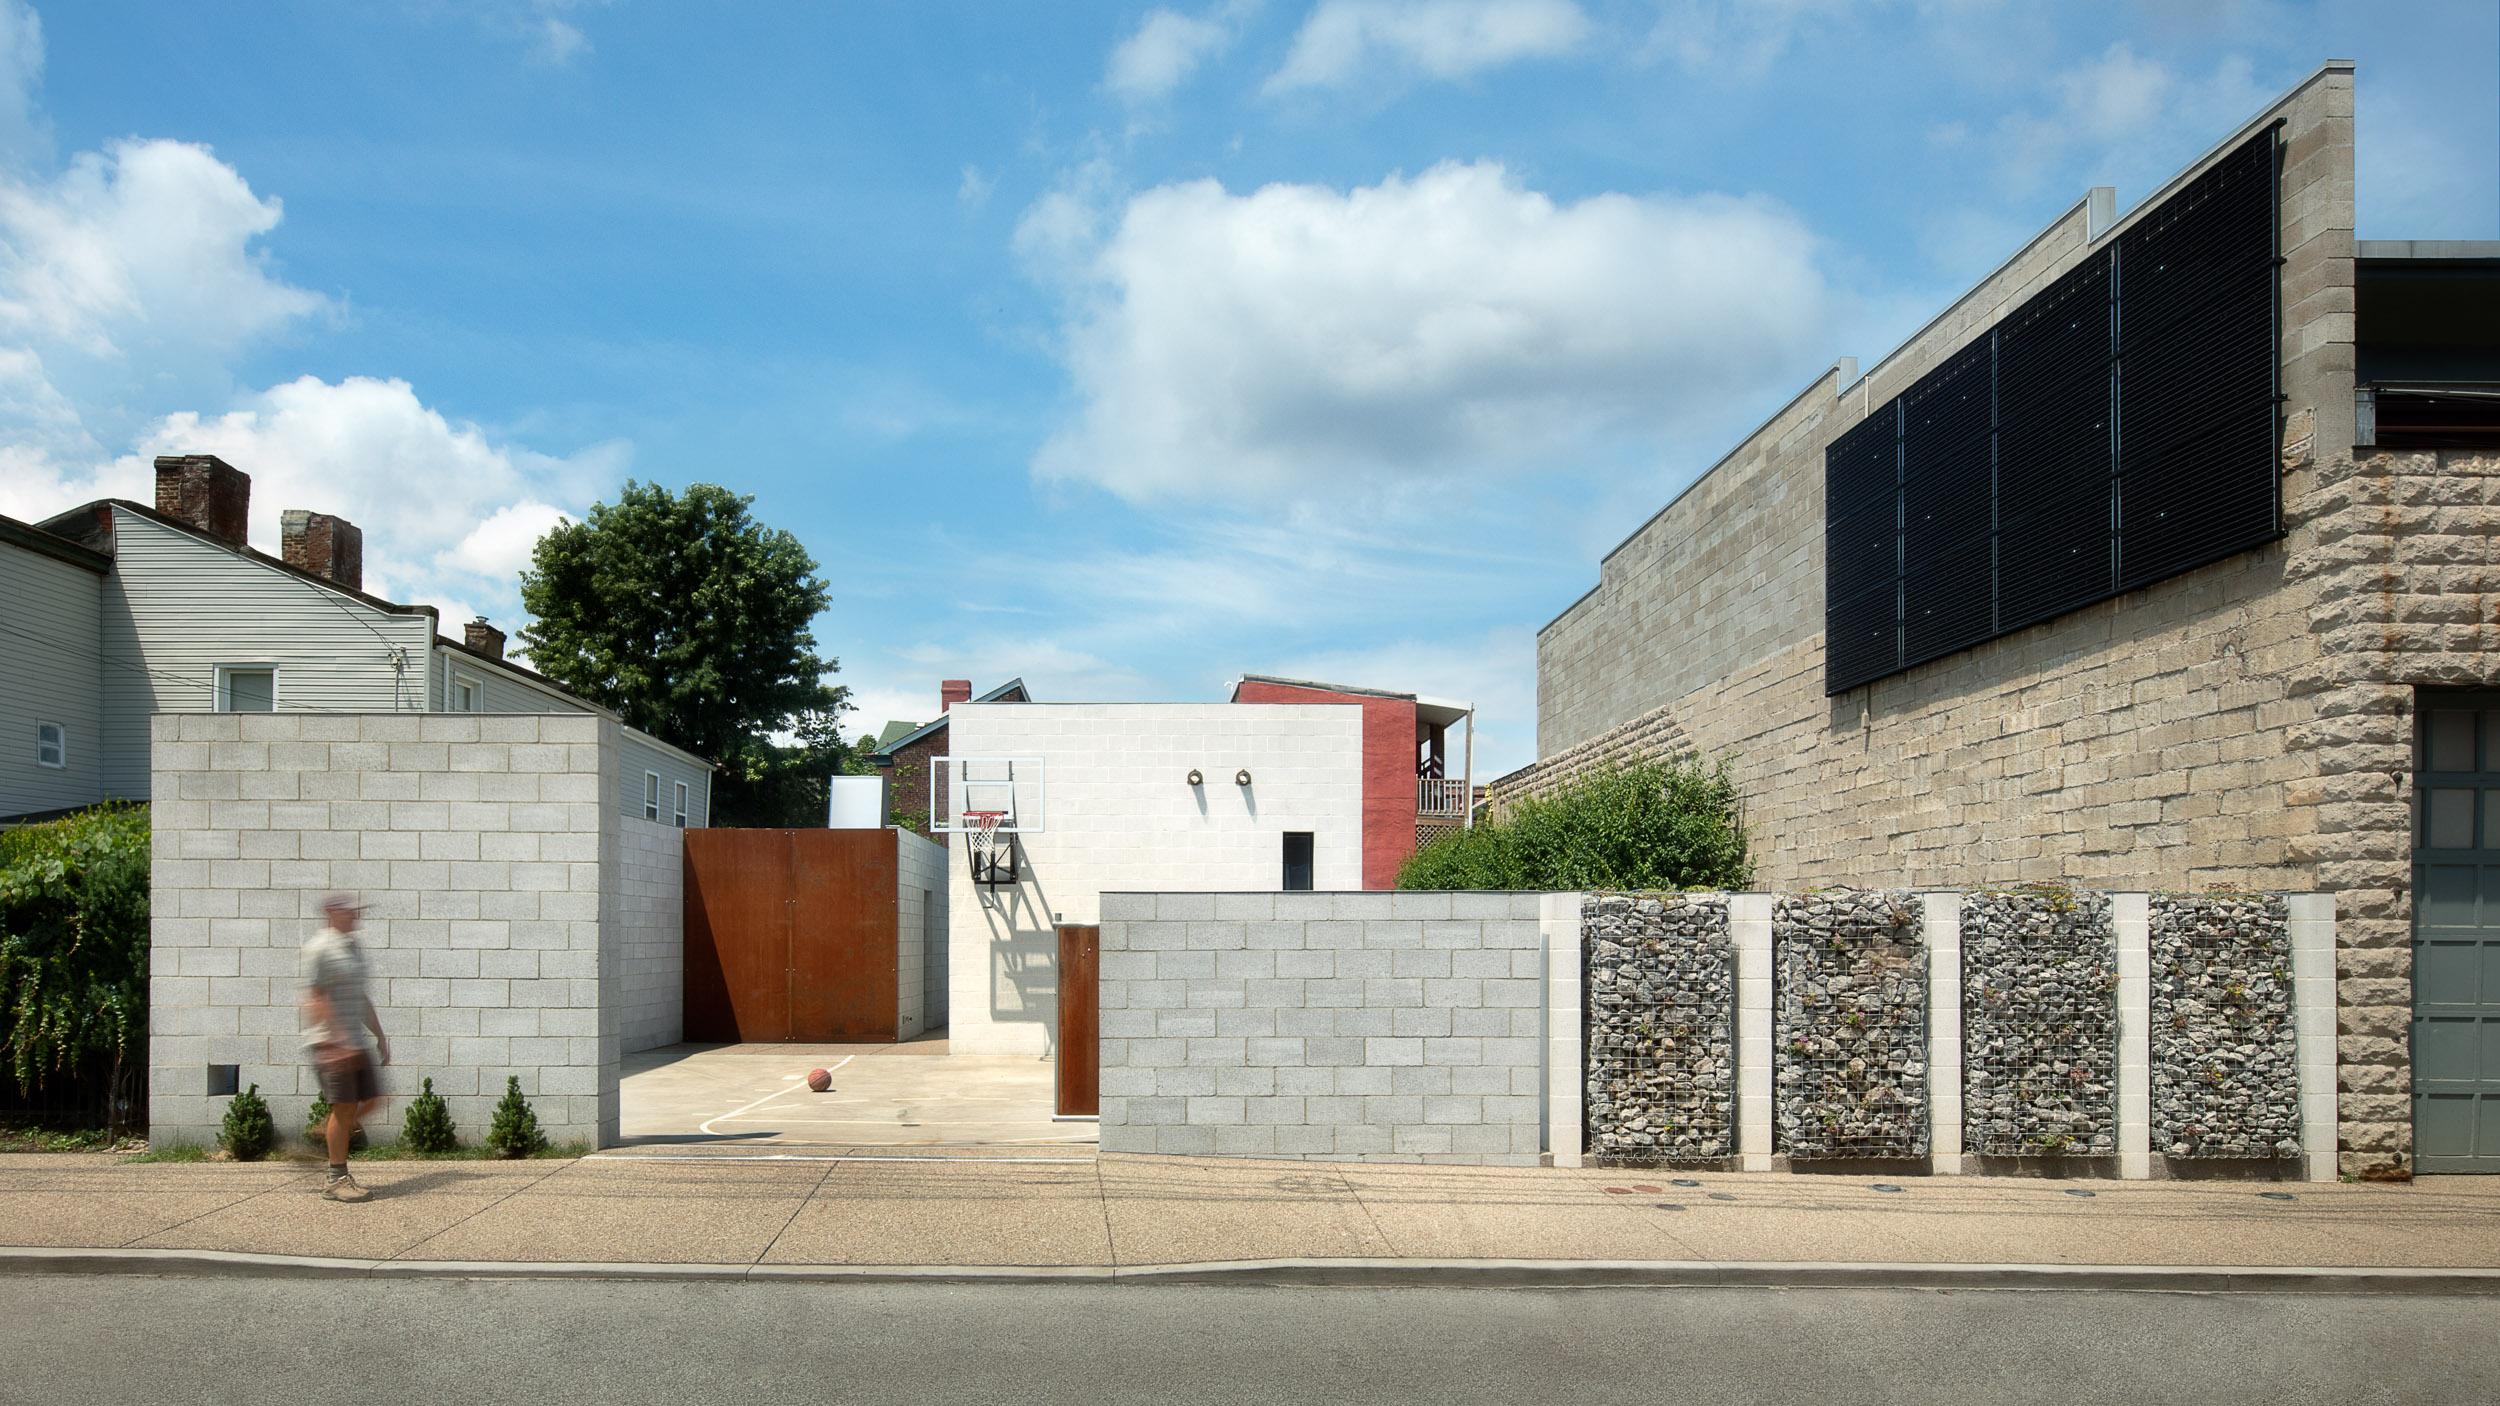 pool_pavilion_pittsburgh_design_poolhouse-2.jpg